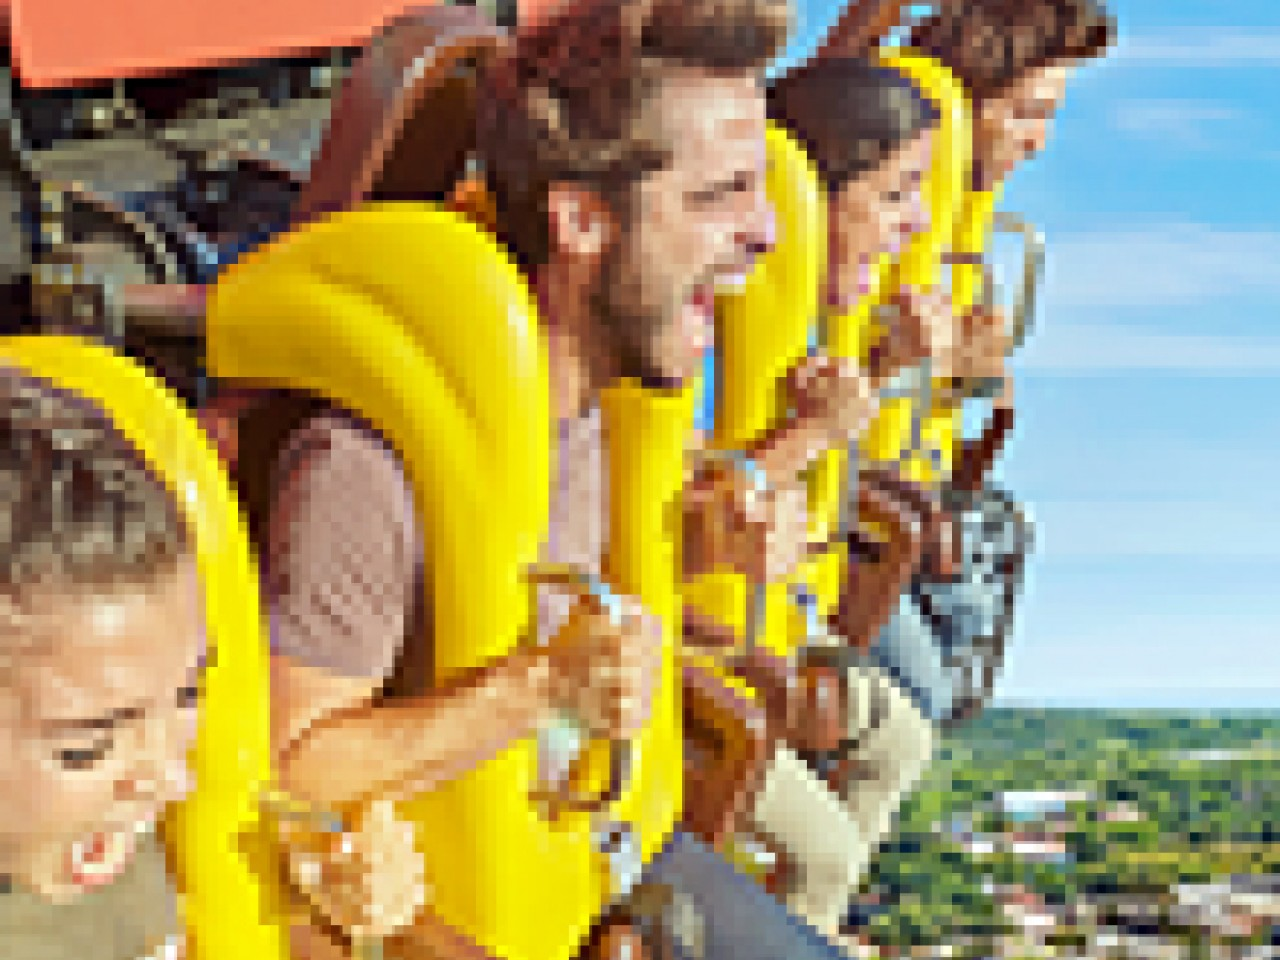 Port Aventura World 3-Day/2-Park Ticket Offer